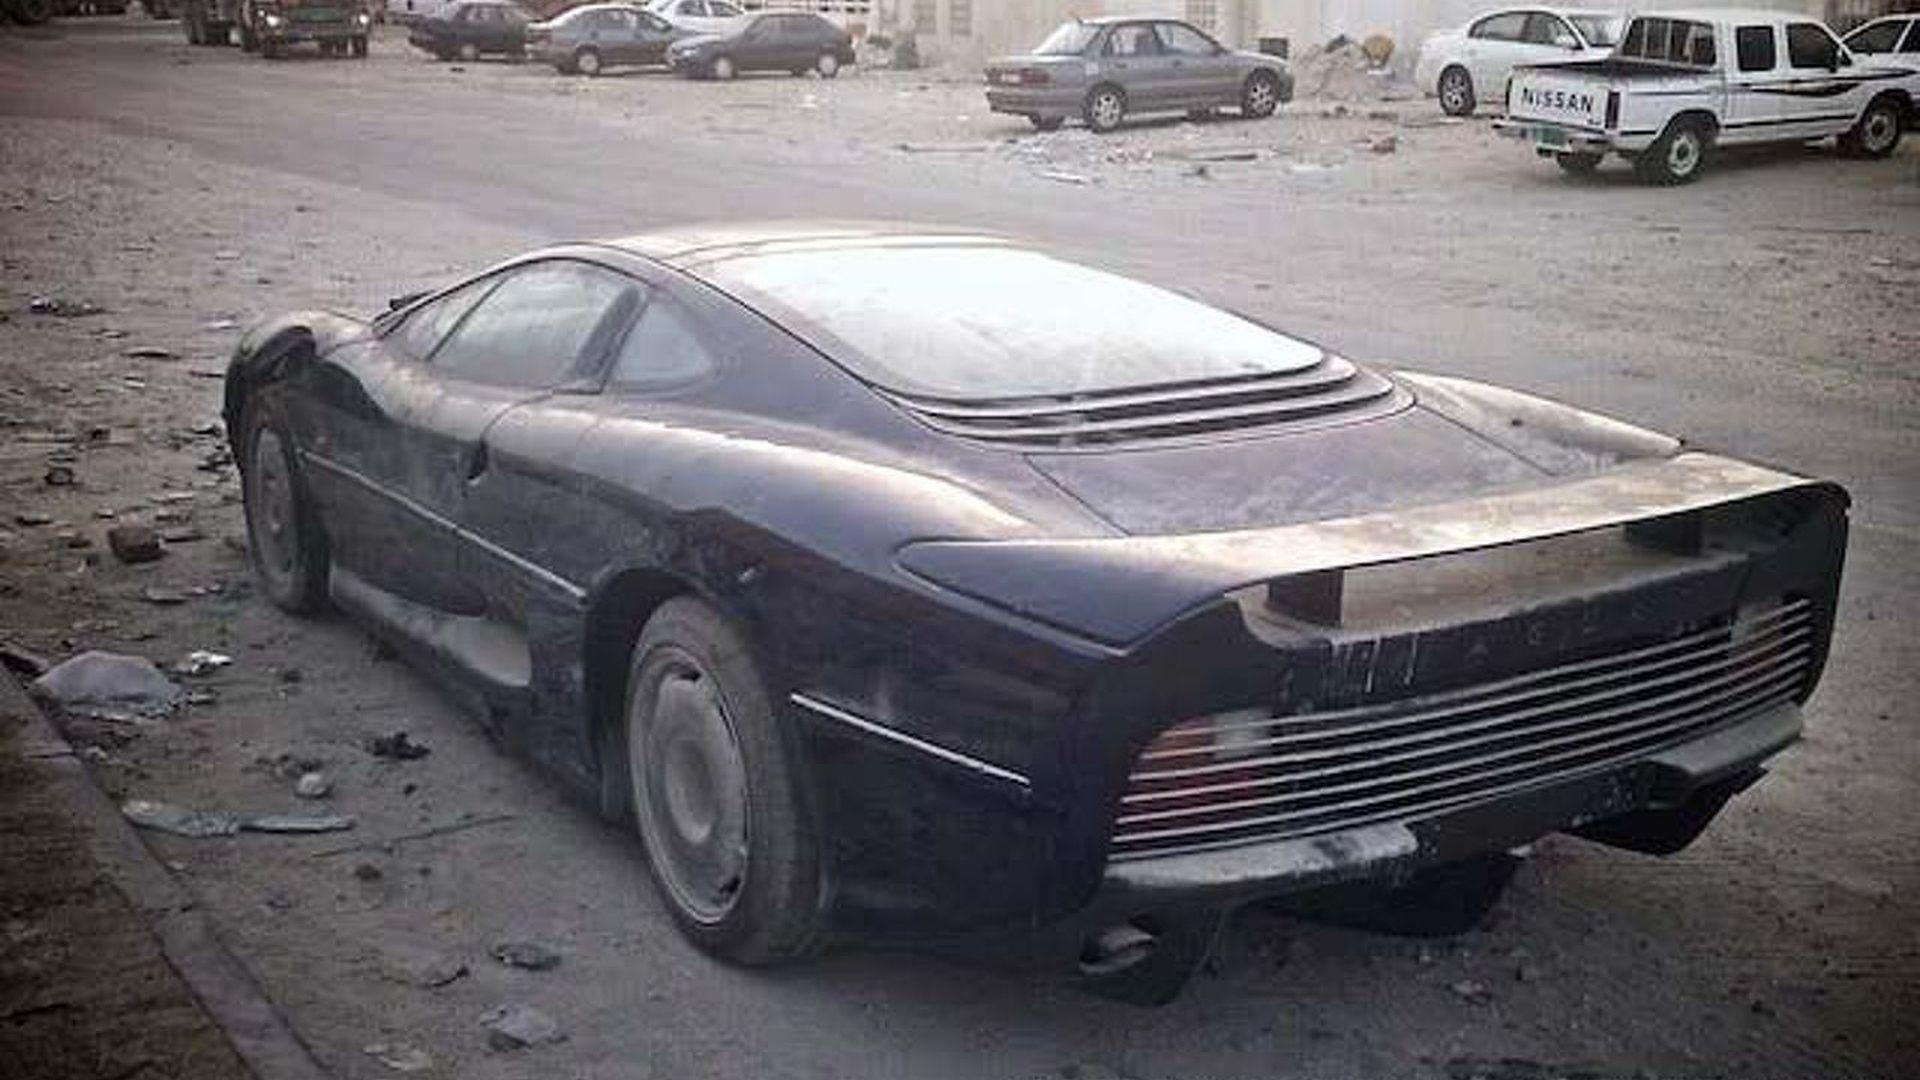 Jaguar Xj220 Left To Perish